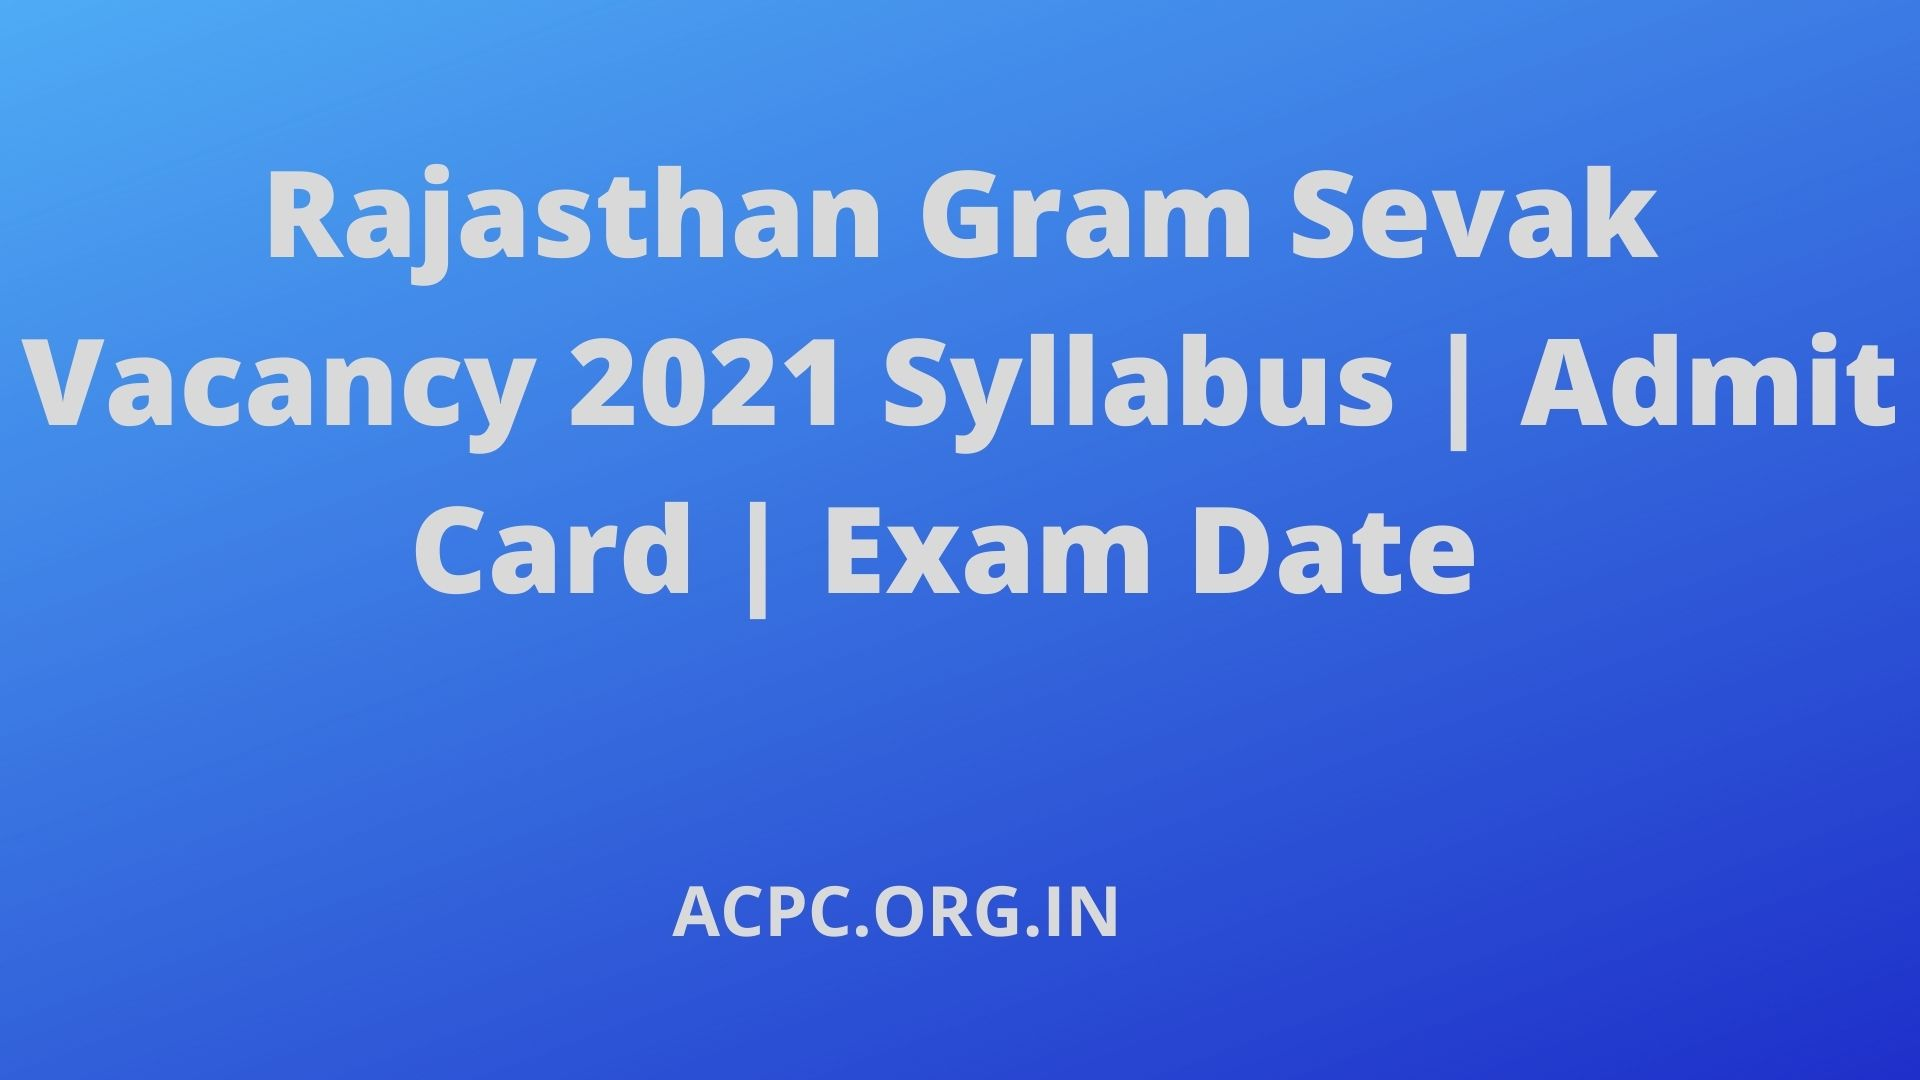 Rajasthan Gram Sevak Vacancy 2021 Syllabus | Admit Card | Exam Date